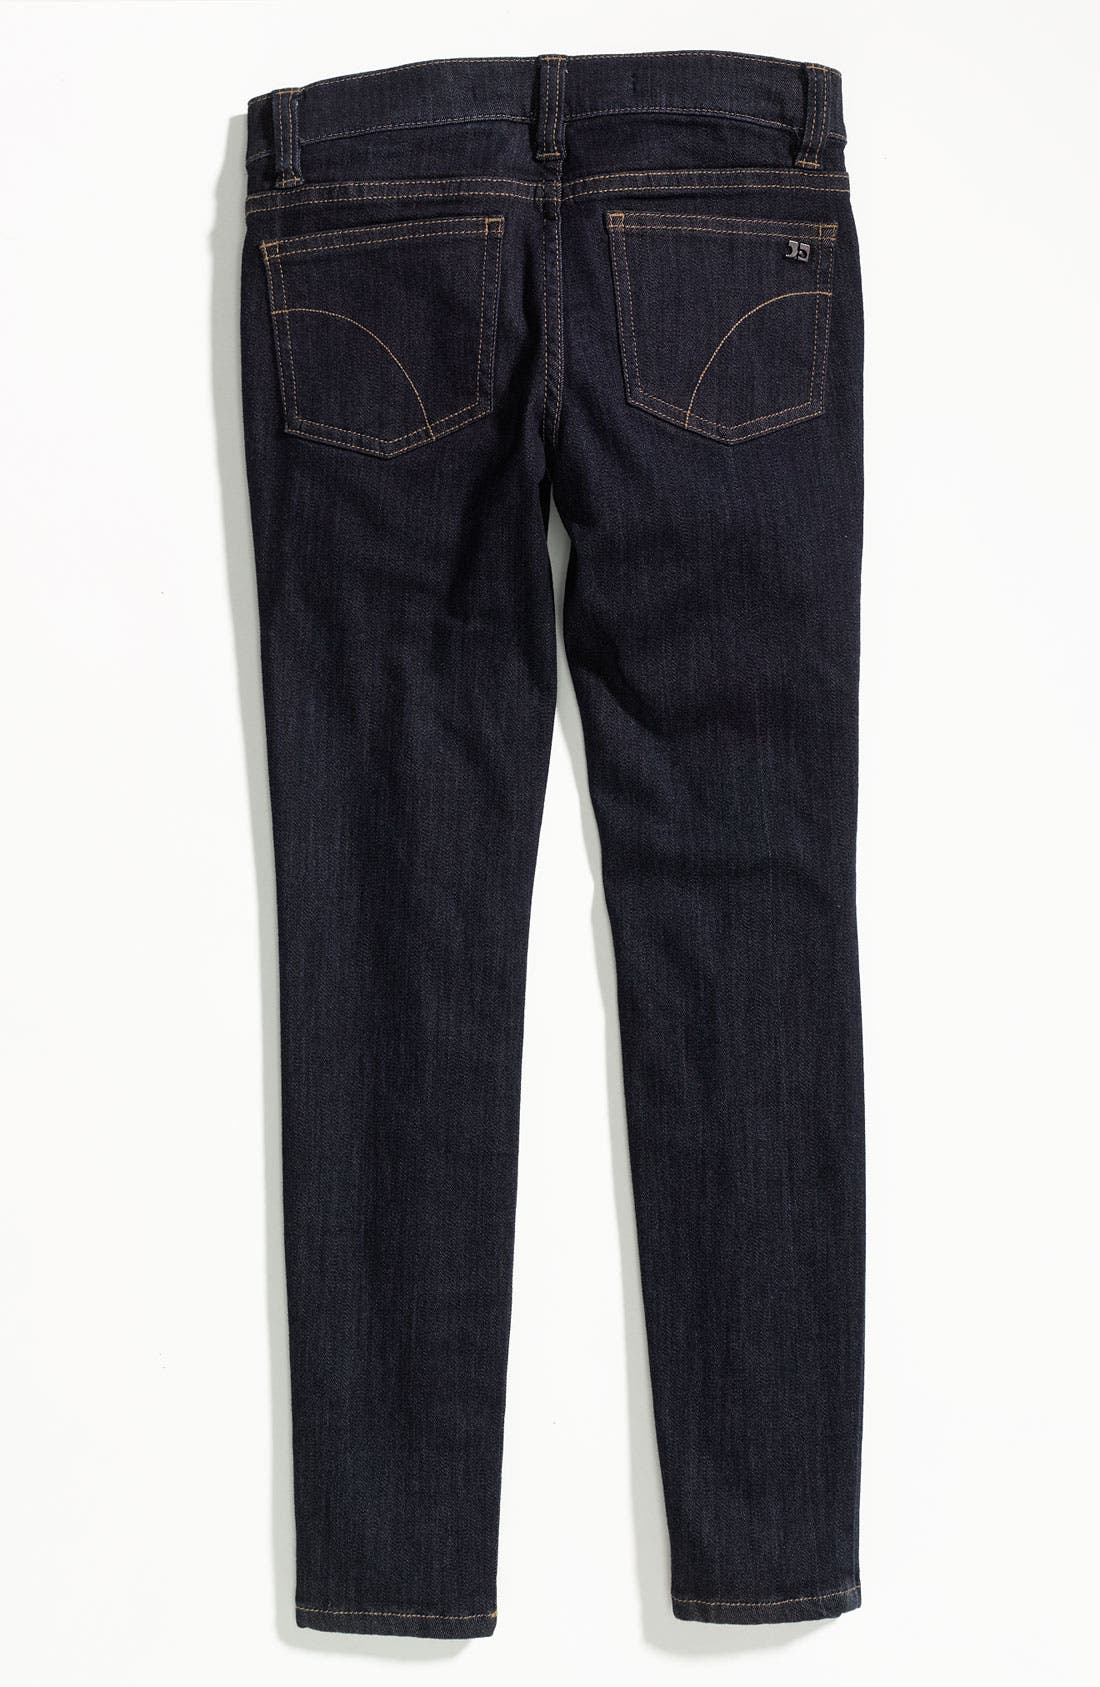 Alternate Image 1 Selected - Joe's Skinny Jeans (Infant)